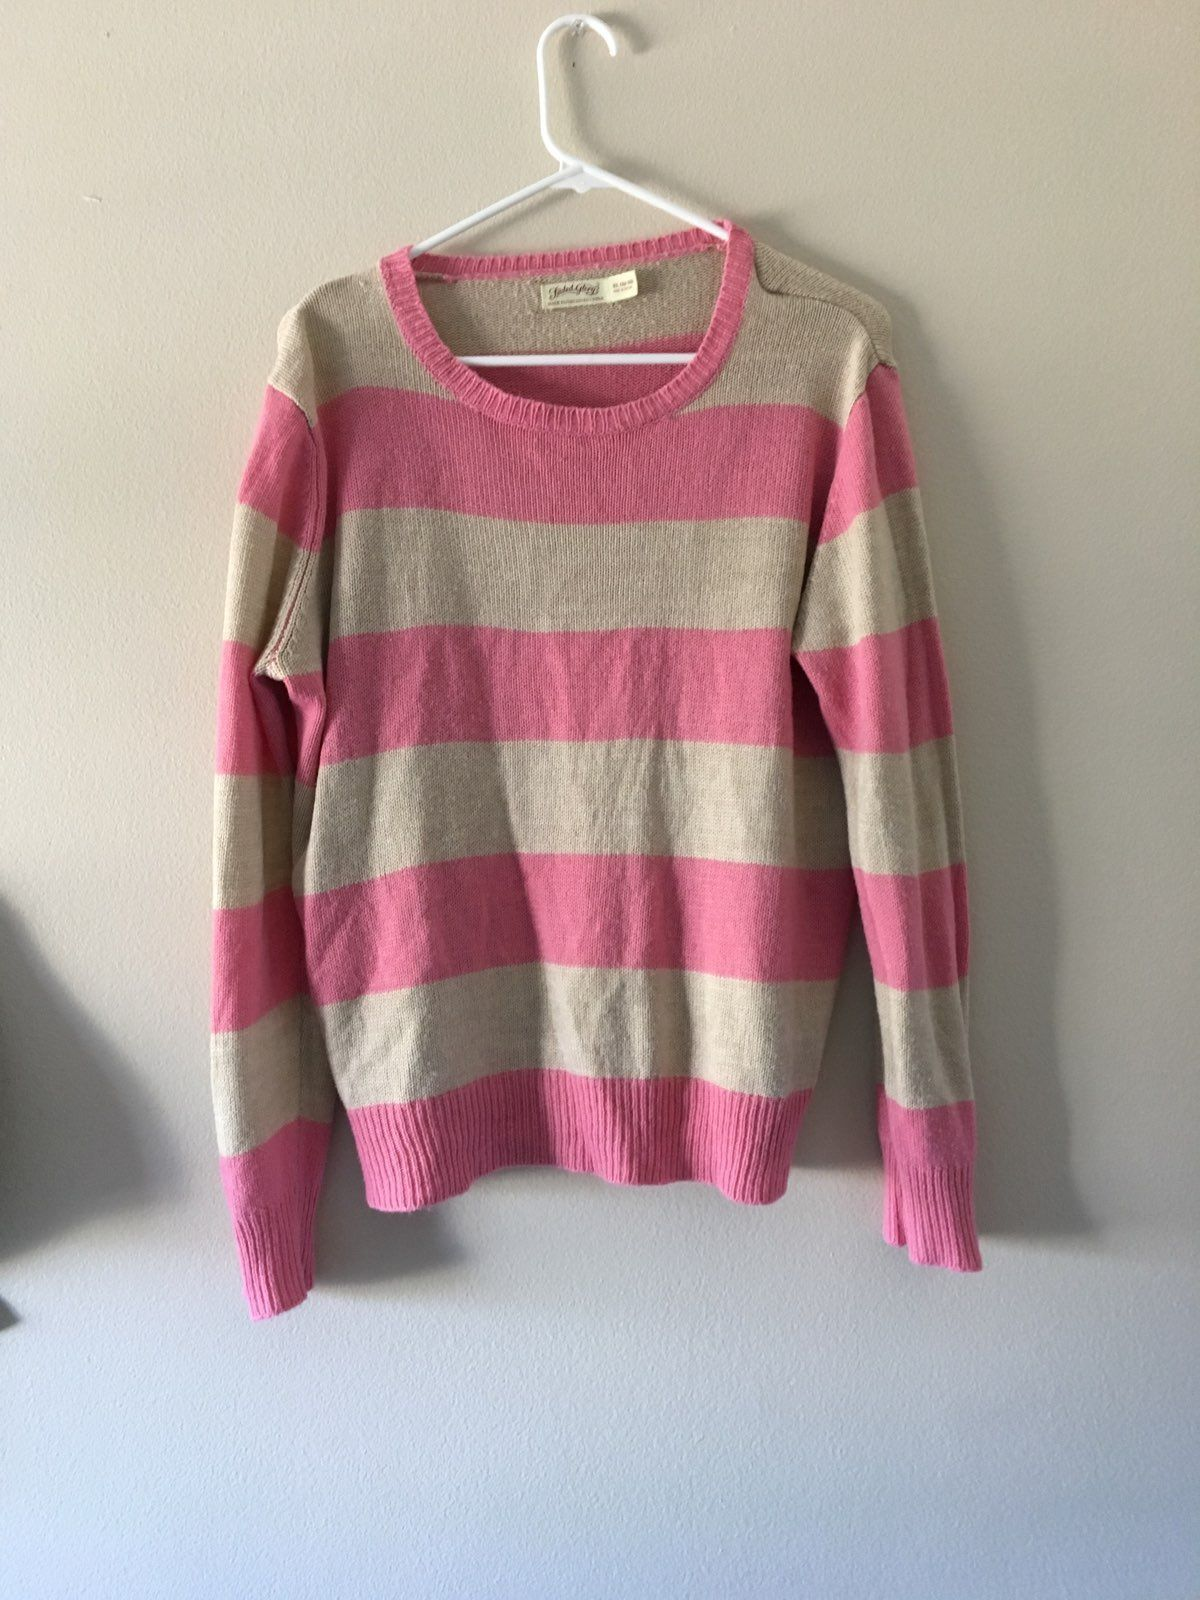 Super Cute Sweater! Oversized! - Mercari: BUY & SELL THINGS YOU LOVE